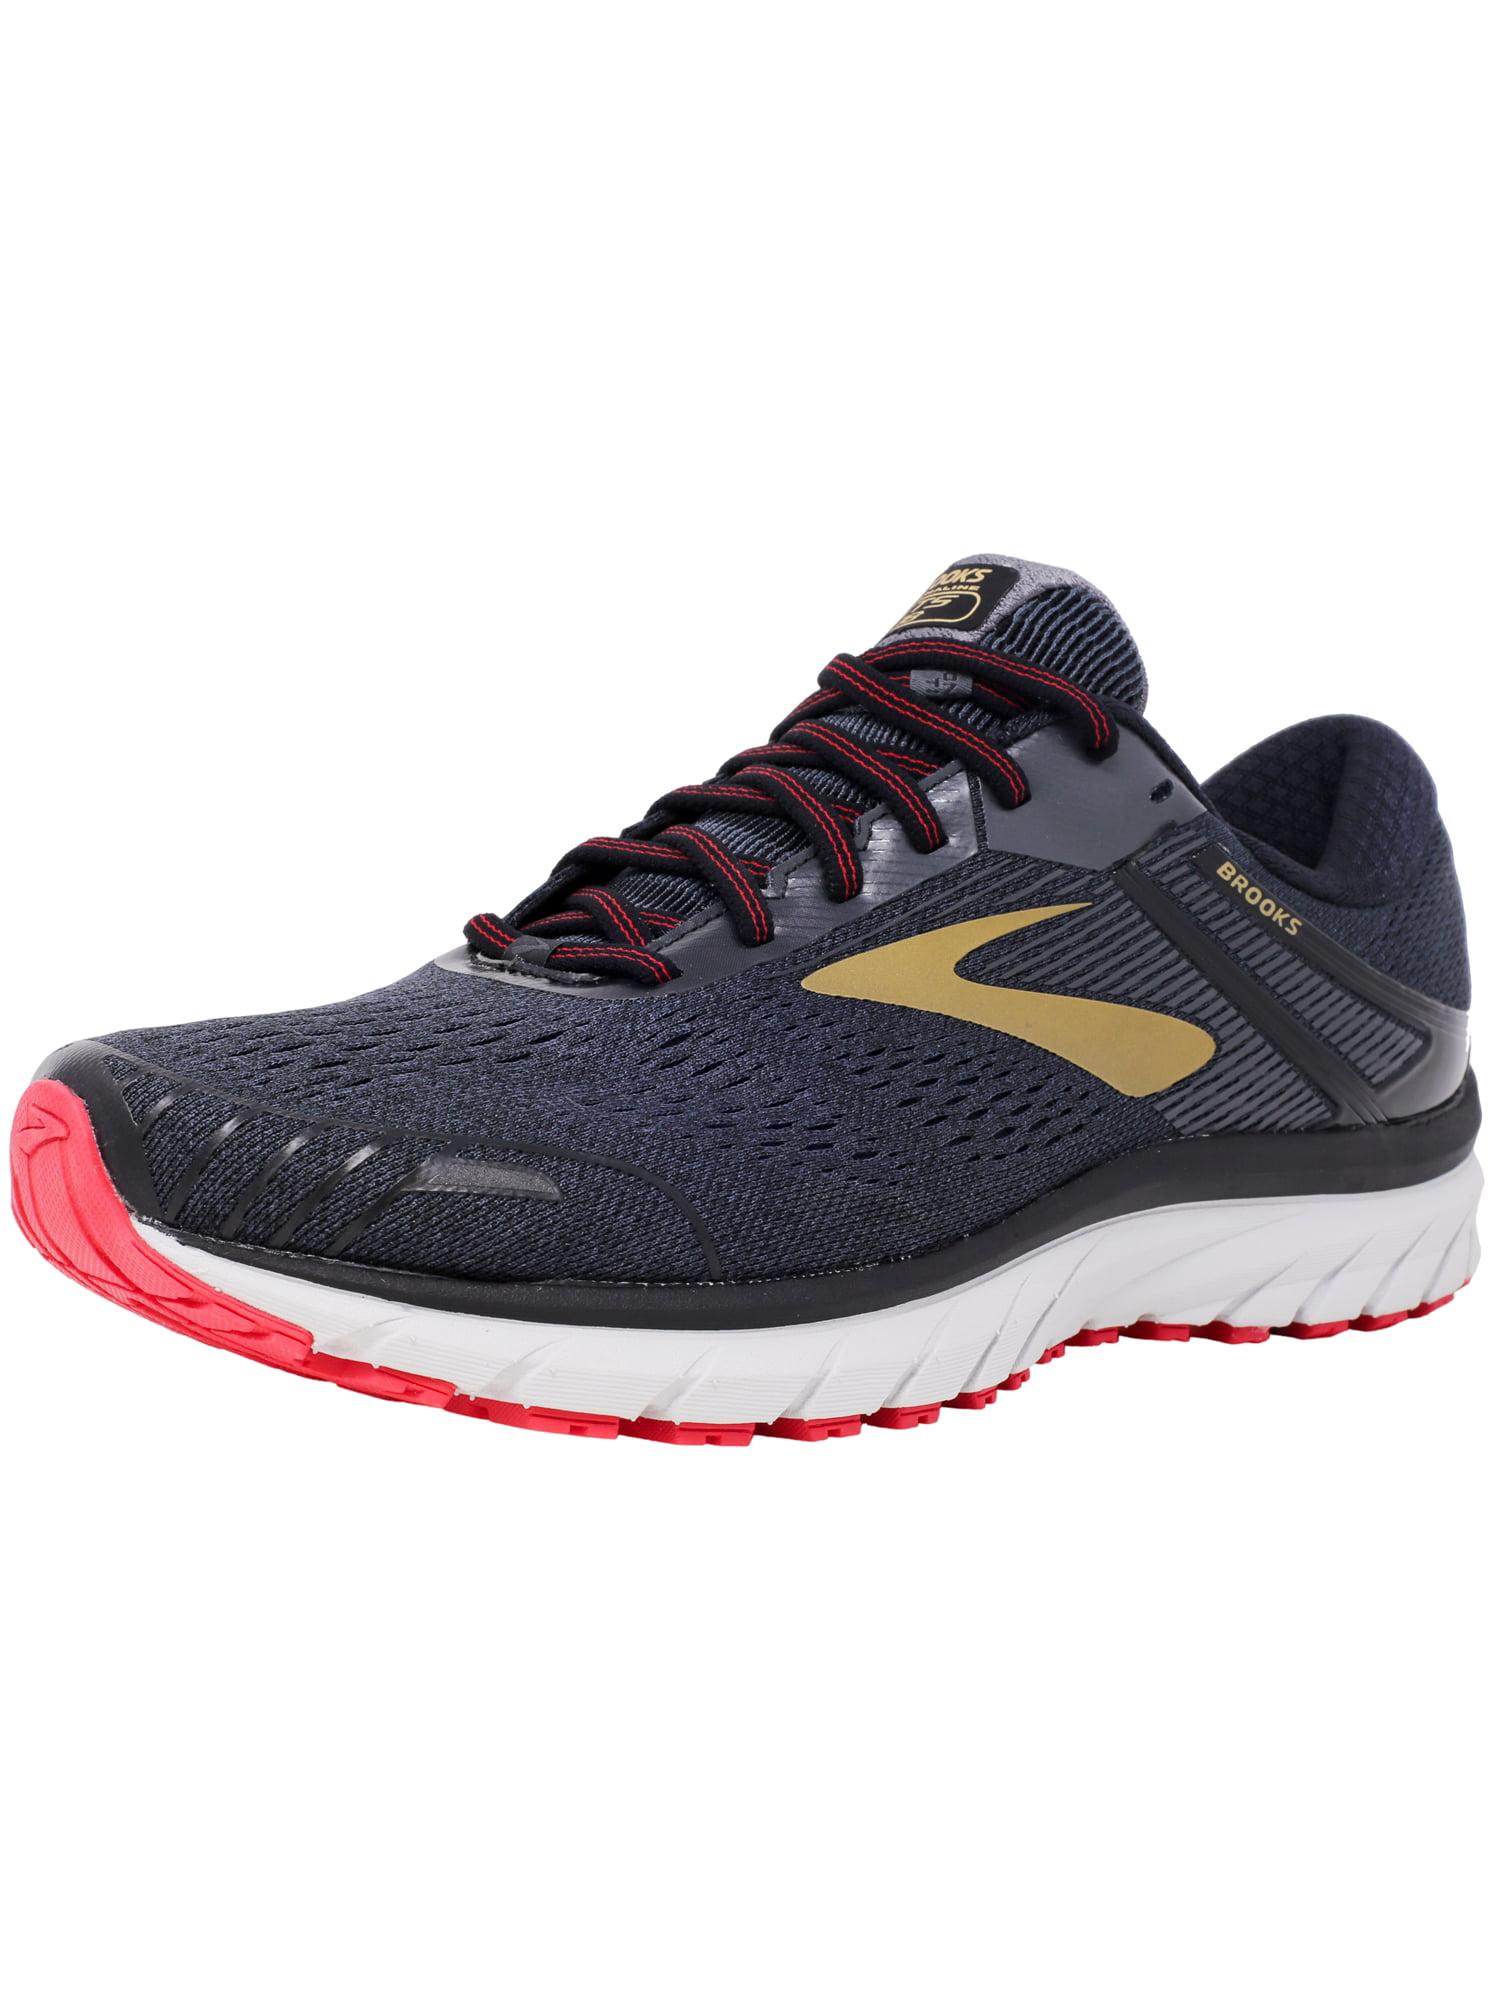 3ebb1d49effc9 Brooks Men s Adrenaline Gts 18 Black   Gold Red Ankle-High Mesh Running Shoe  - 13W